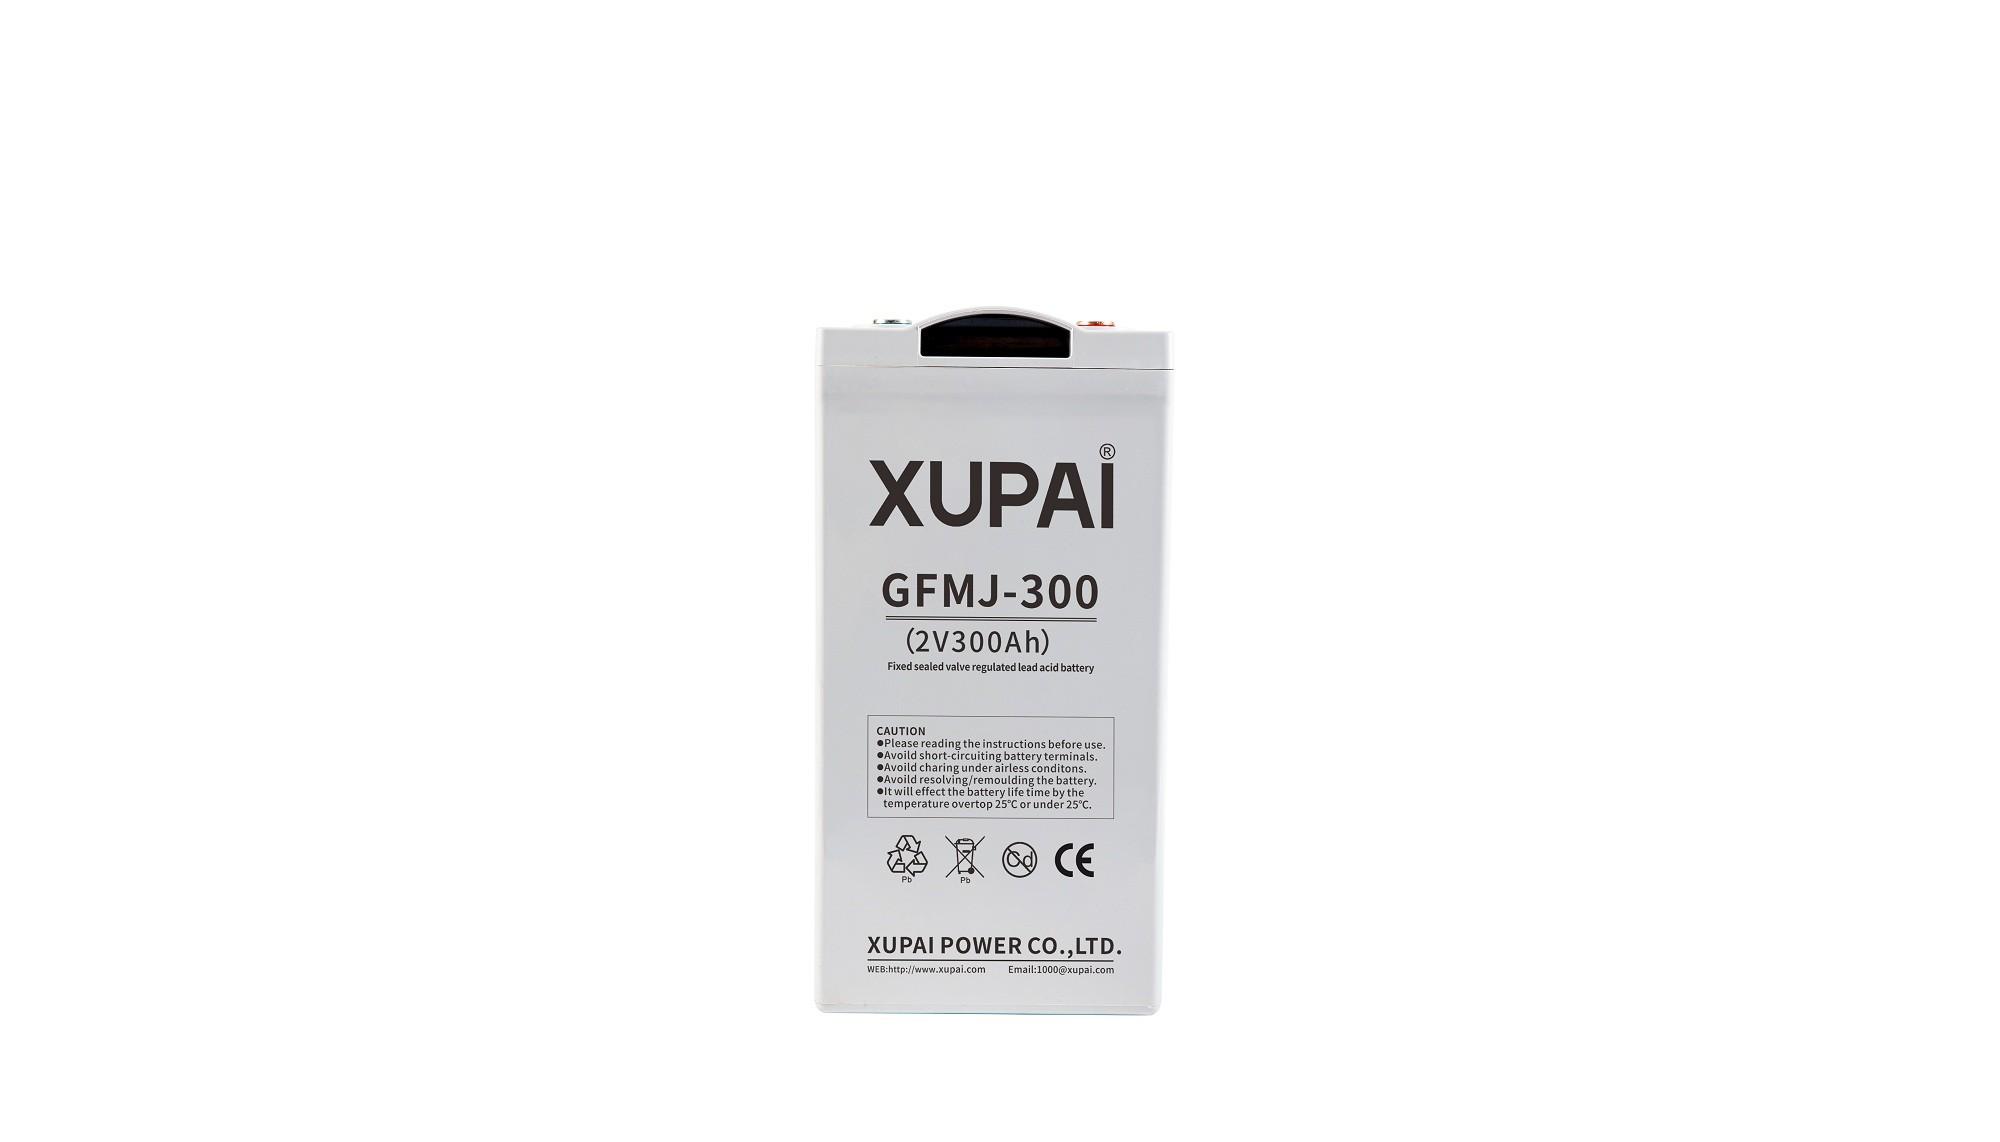 XUPAI GFMJ-300 long life backup  base station GEL battery